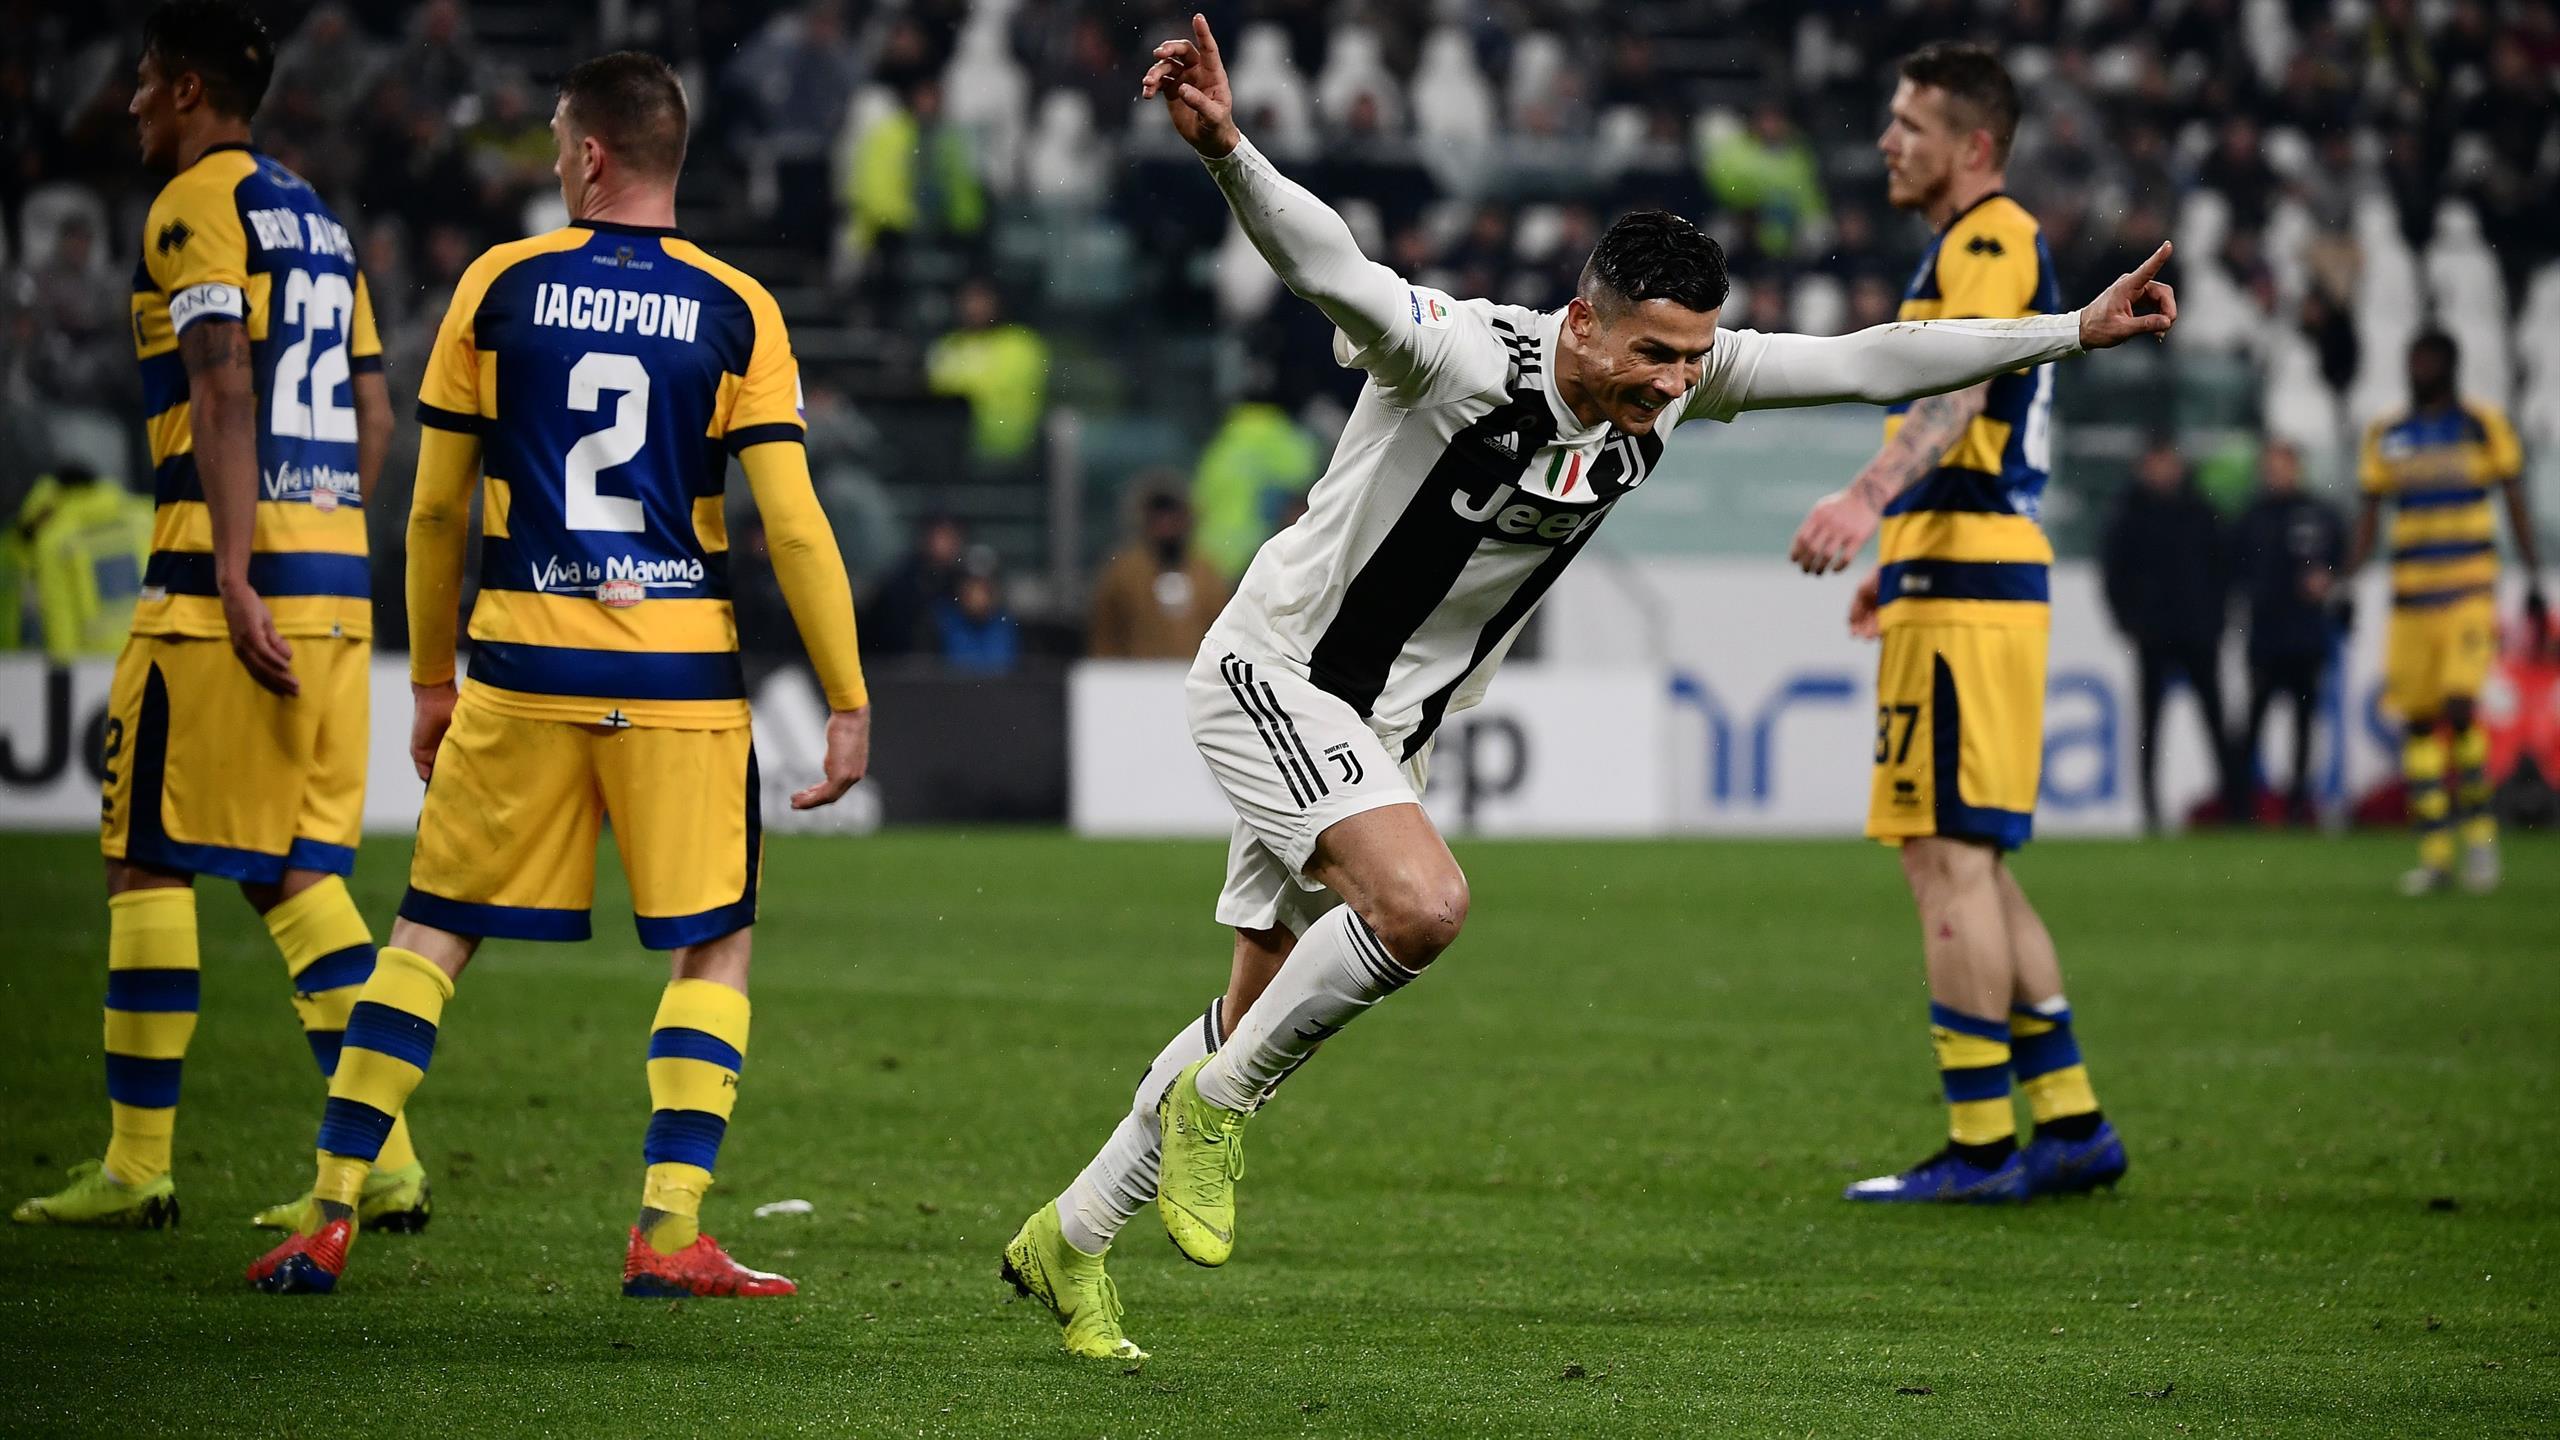 Juventus-Parma in Diretta tv e Live-Streaming - Eurosport